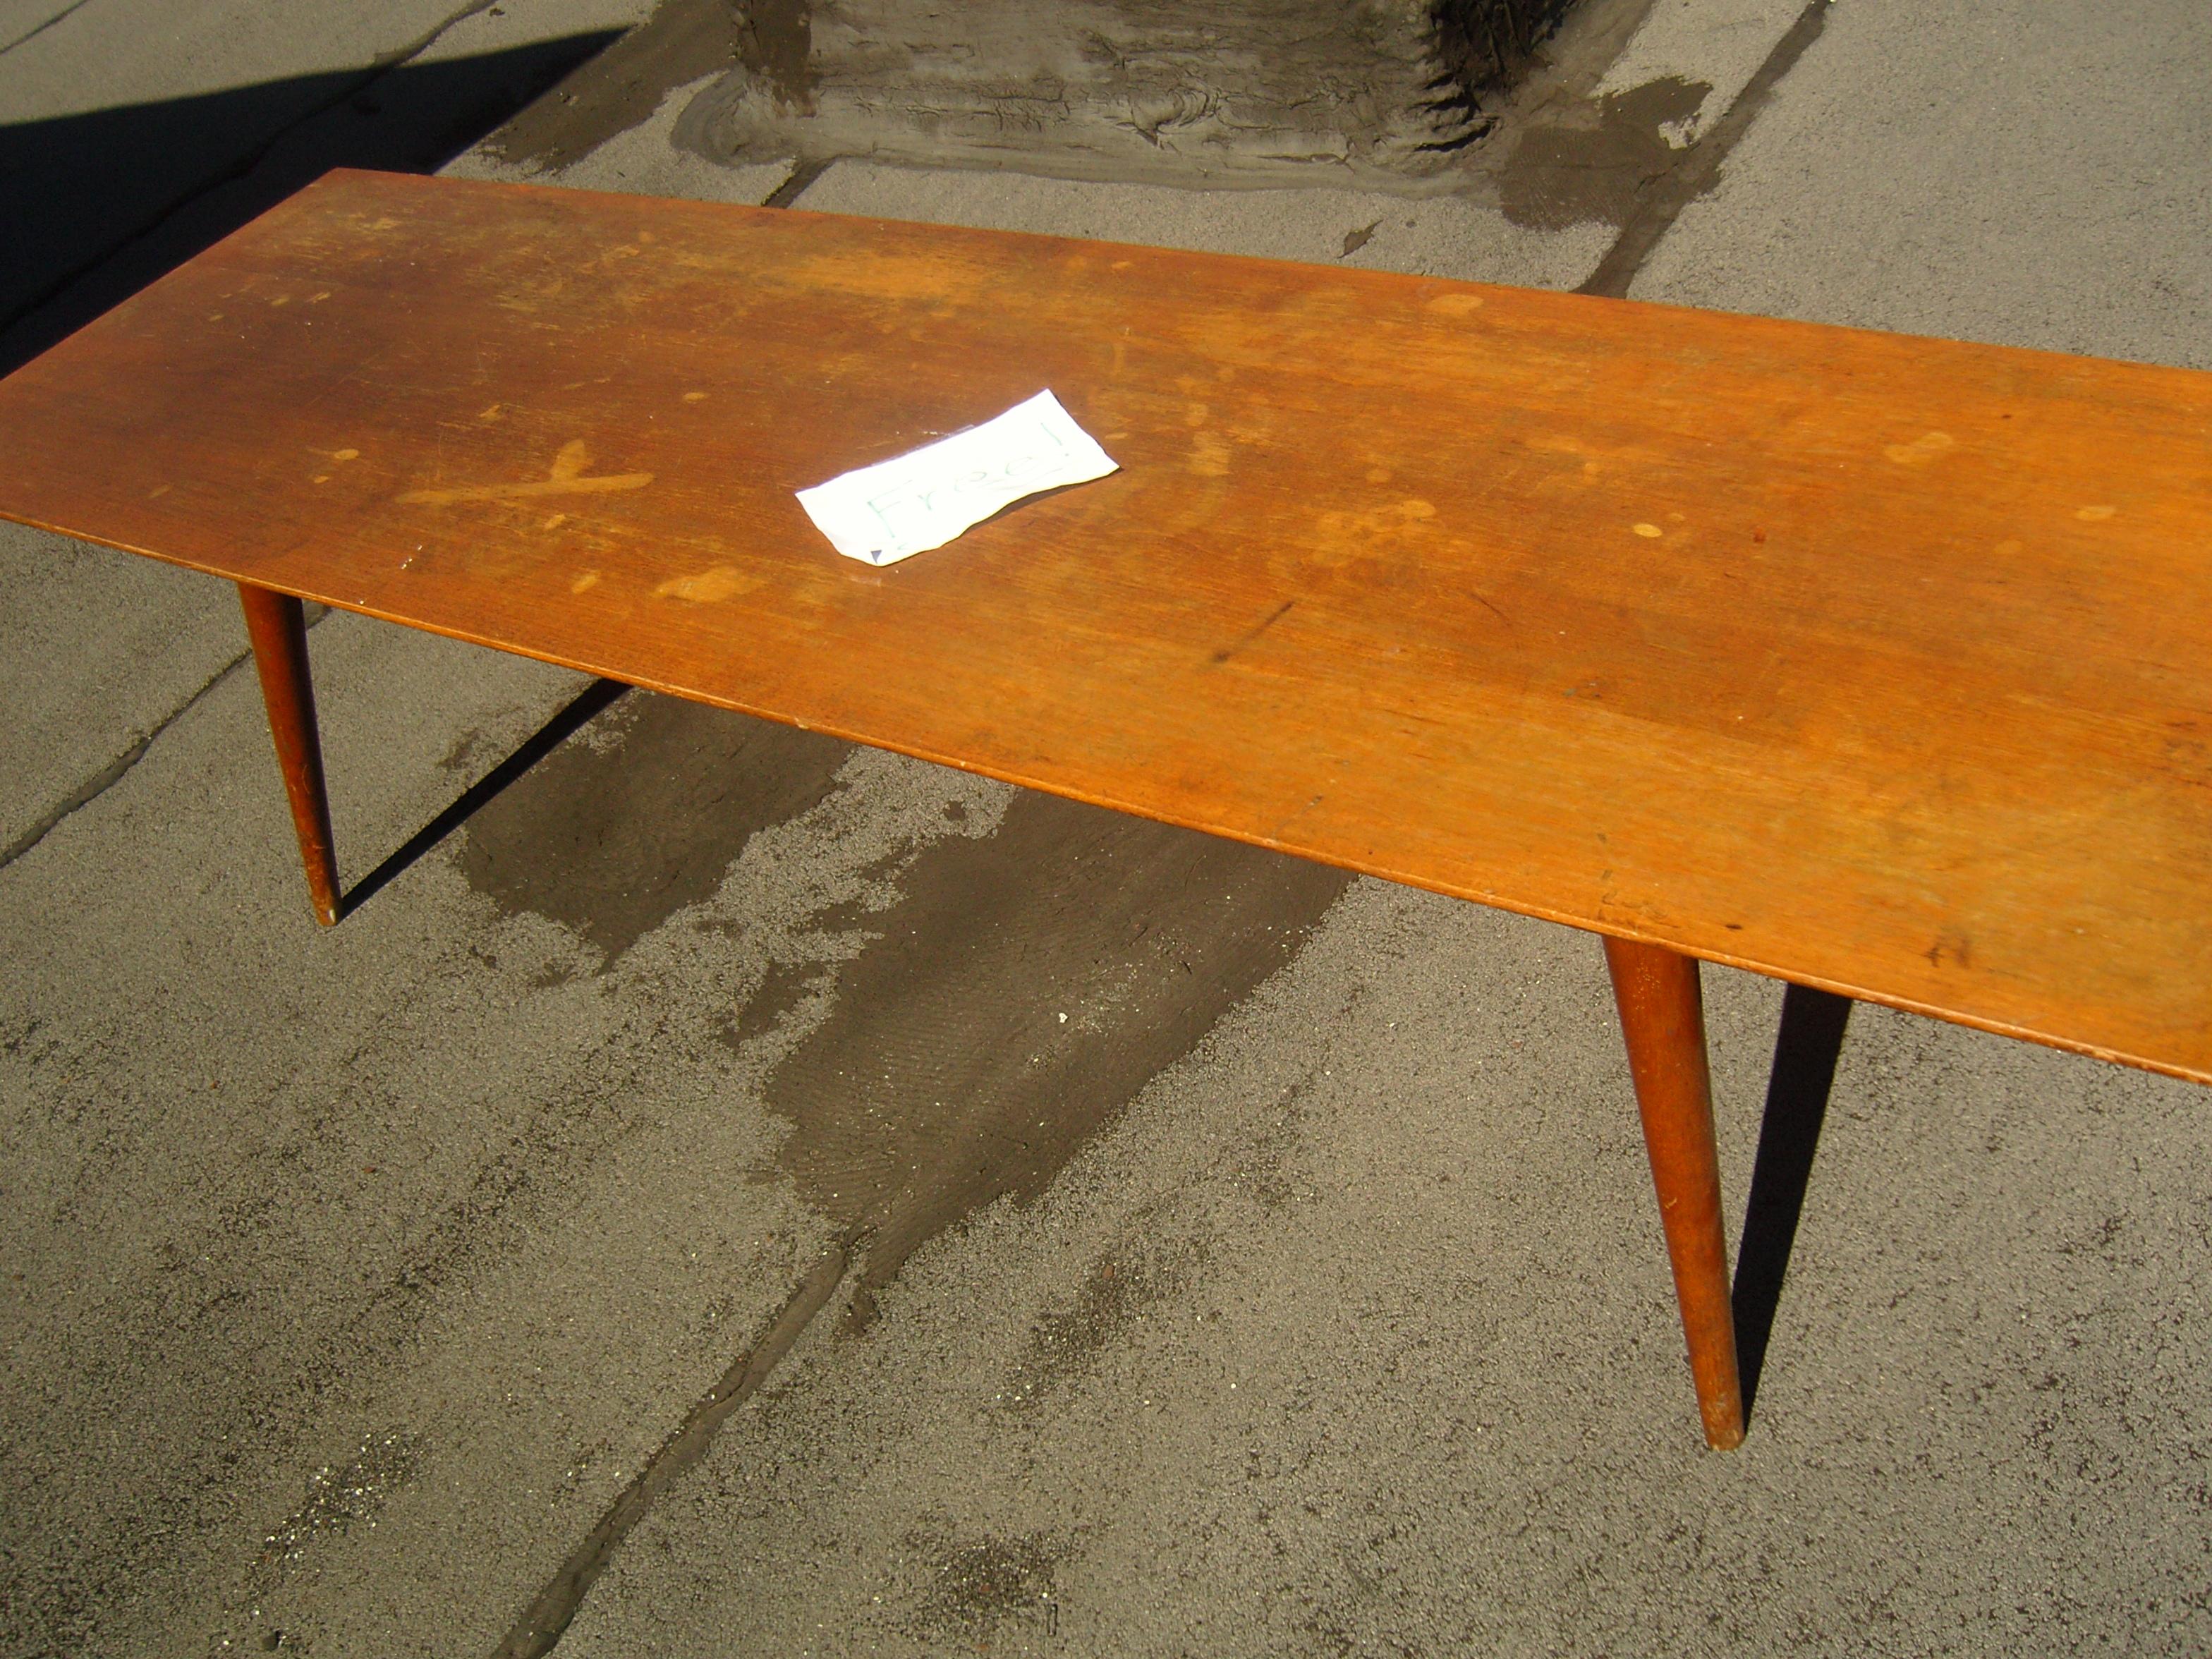 Nj Craigslist Furniture Decoration Access